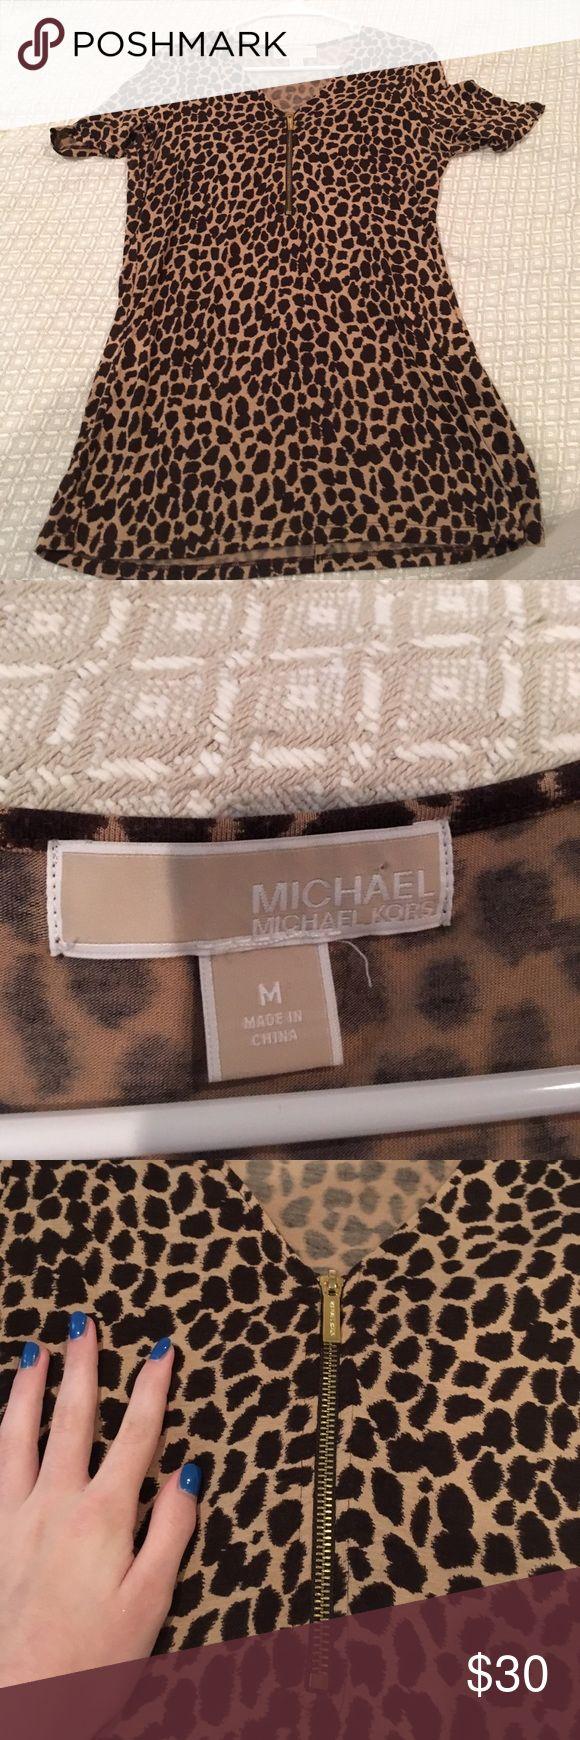 Micheal Kors cheetah print short sleeve shirt Michael Kors cheetah print shirt. LIKE BRAND NEW! Worn once! Very soft material! Michael Kors Tops Blouses